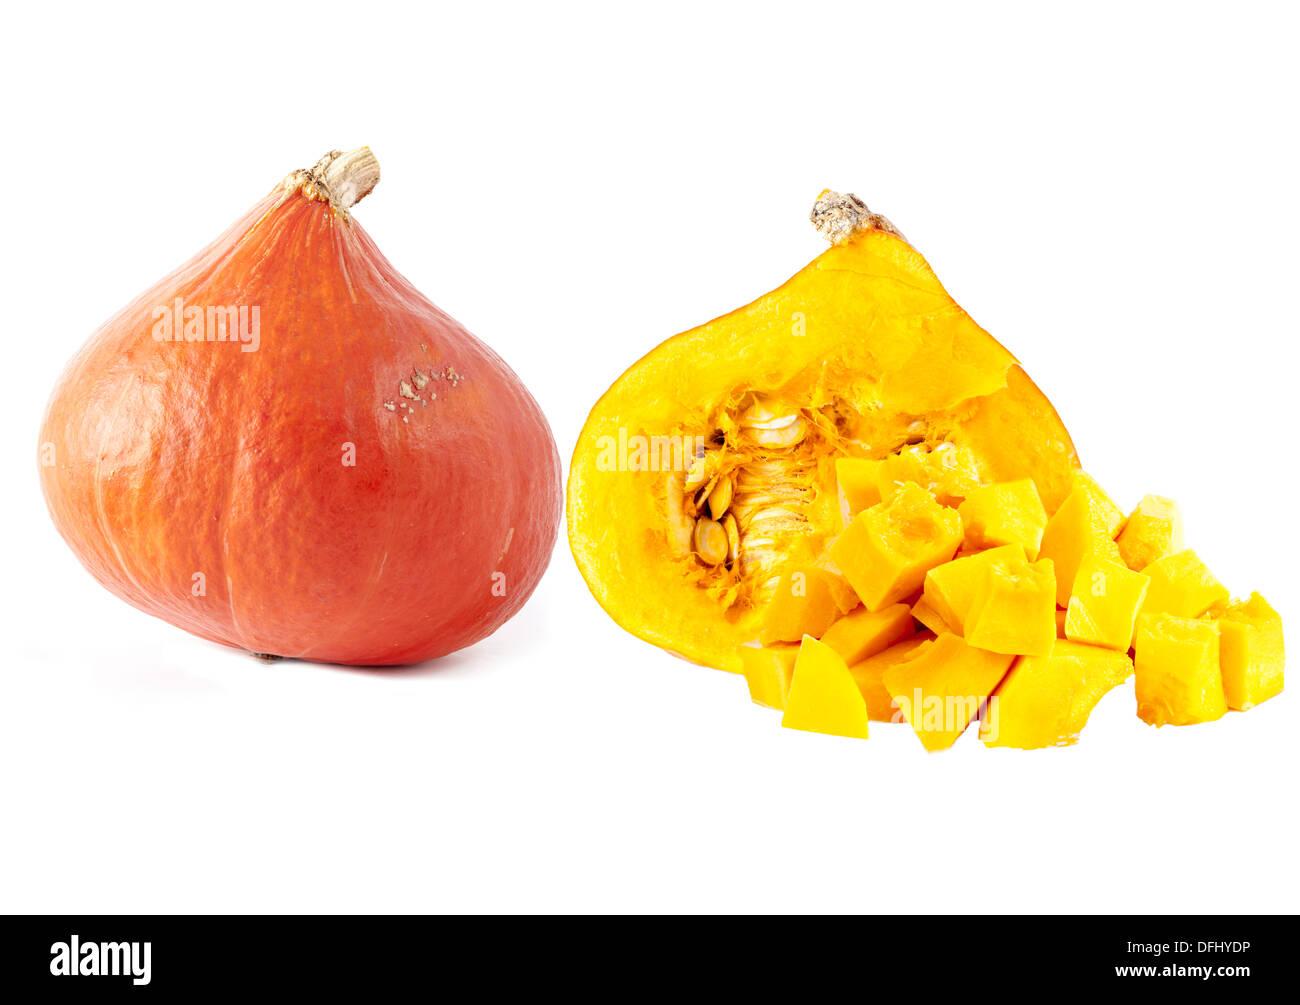 OrangeHokkaido Pumpkin (Red kuri squash) Stock Photo